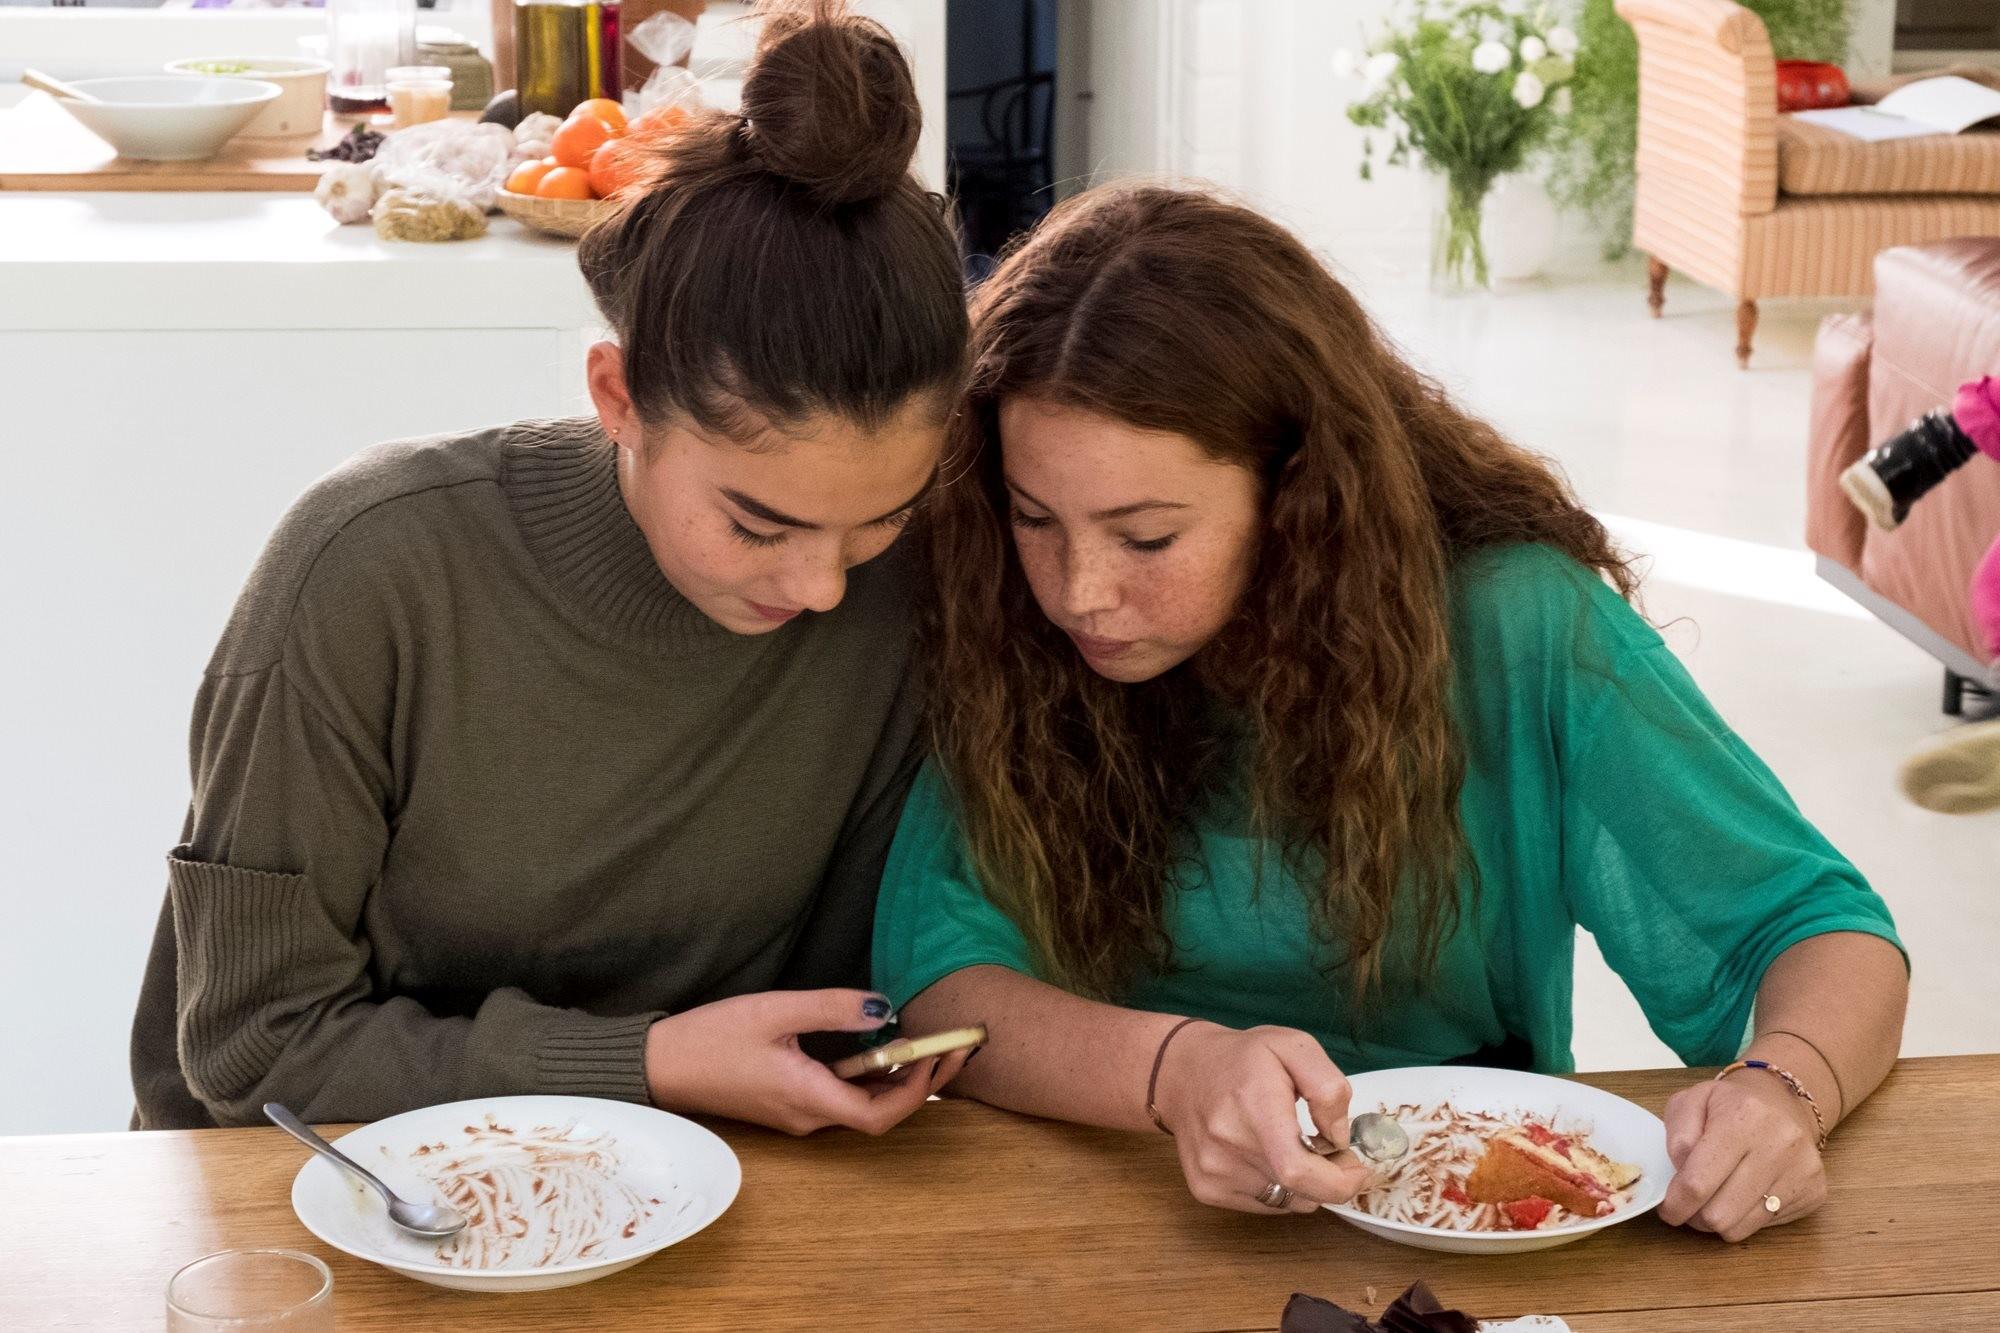 Dos chicas adolescentes miran un teléfono móvil